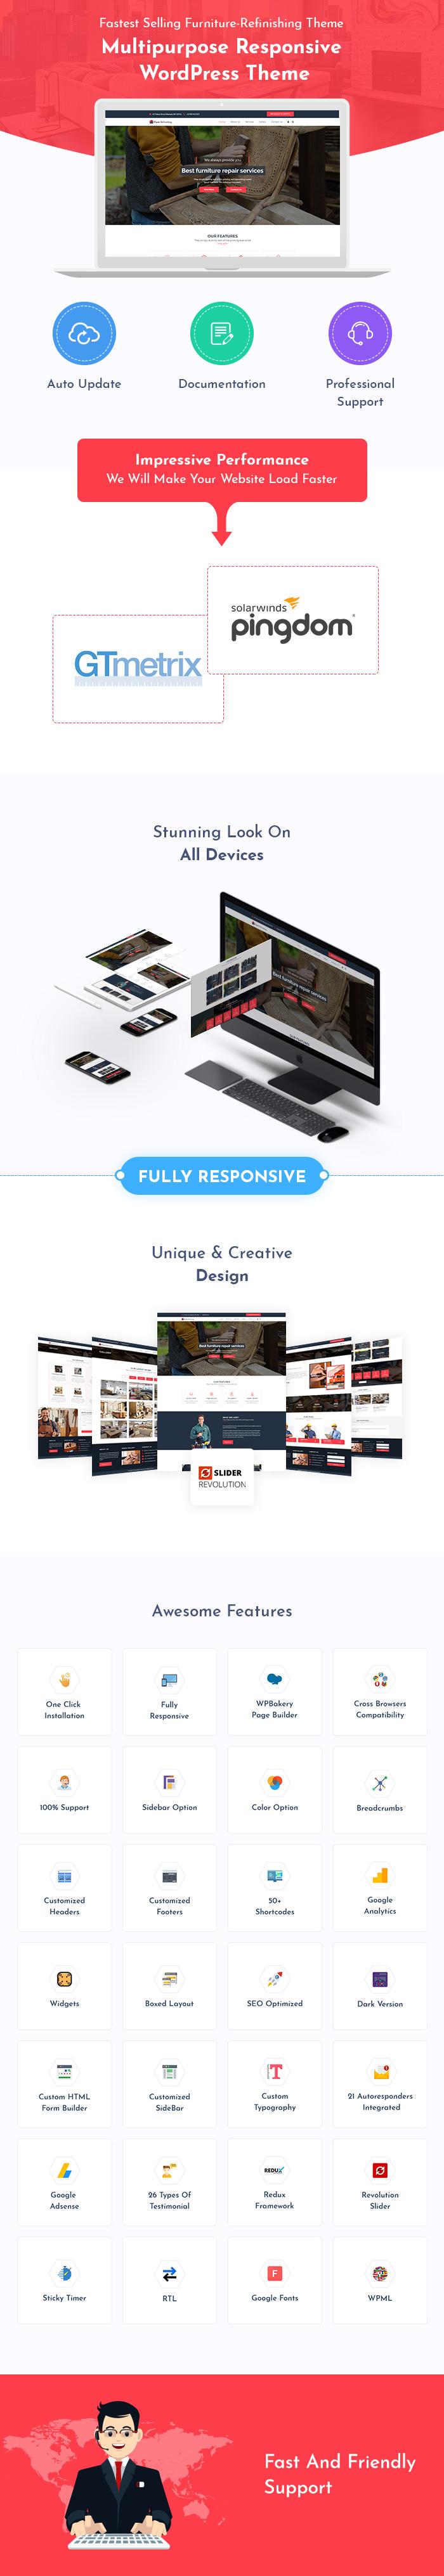 Furniture Refinishing WordPress Themes